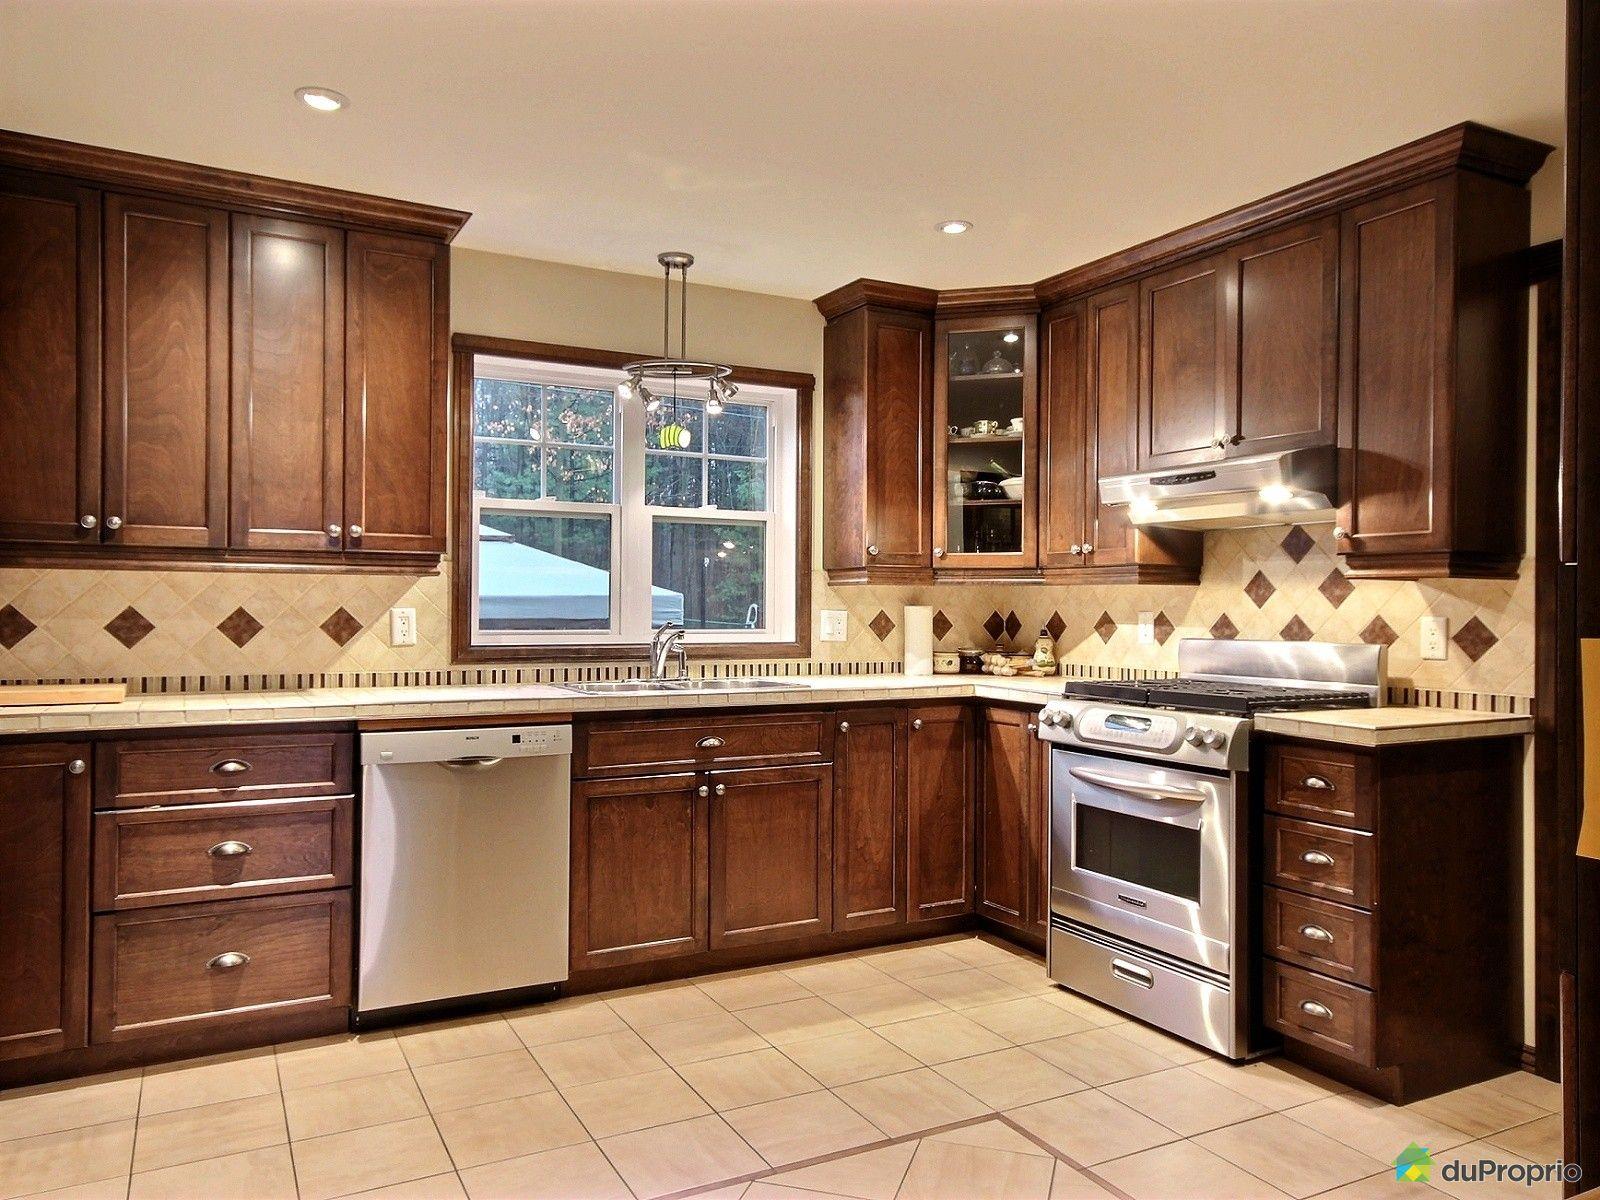 maison vendre drummondville 1030 rue morse immobilier qu bec duproprio 564094. Black Bedroom Furniture Sets. Home Design Ideas